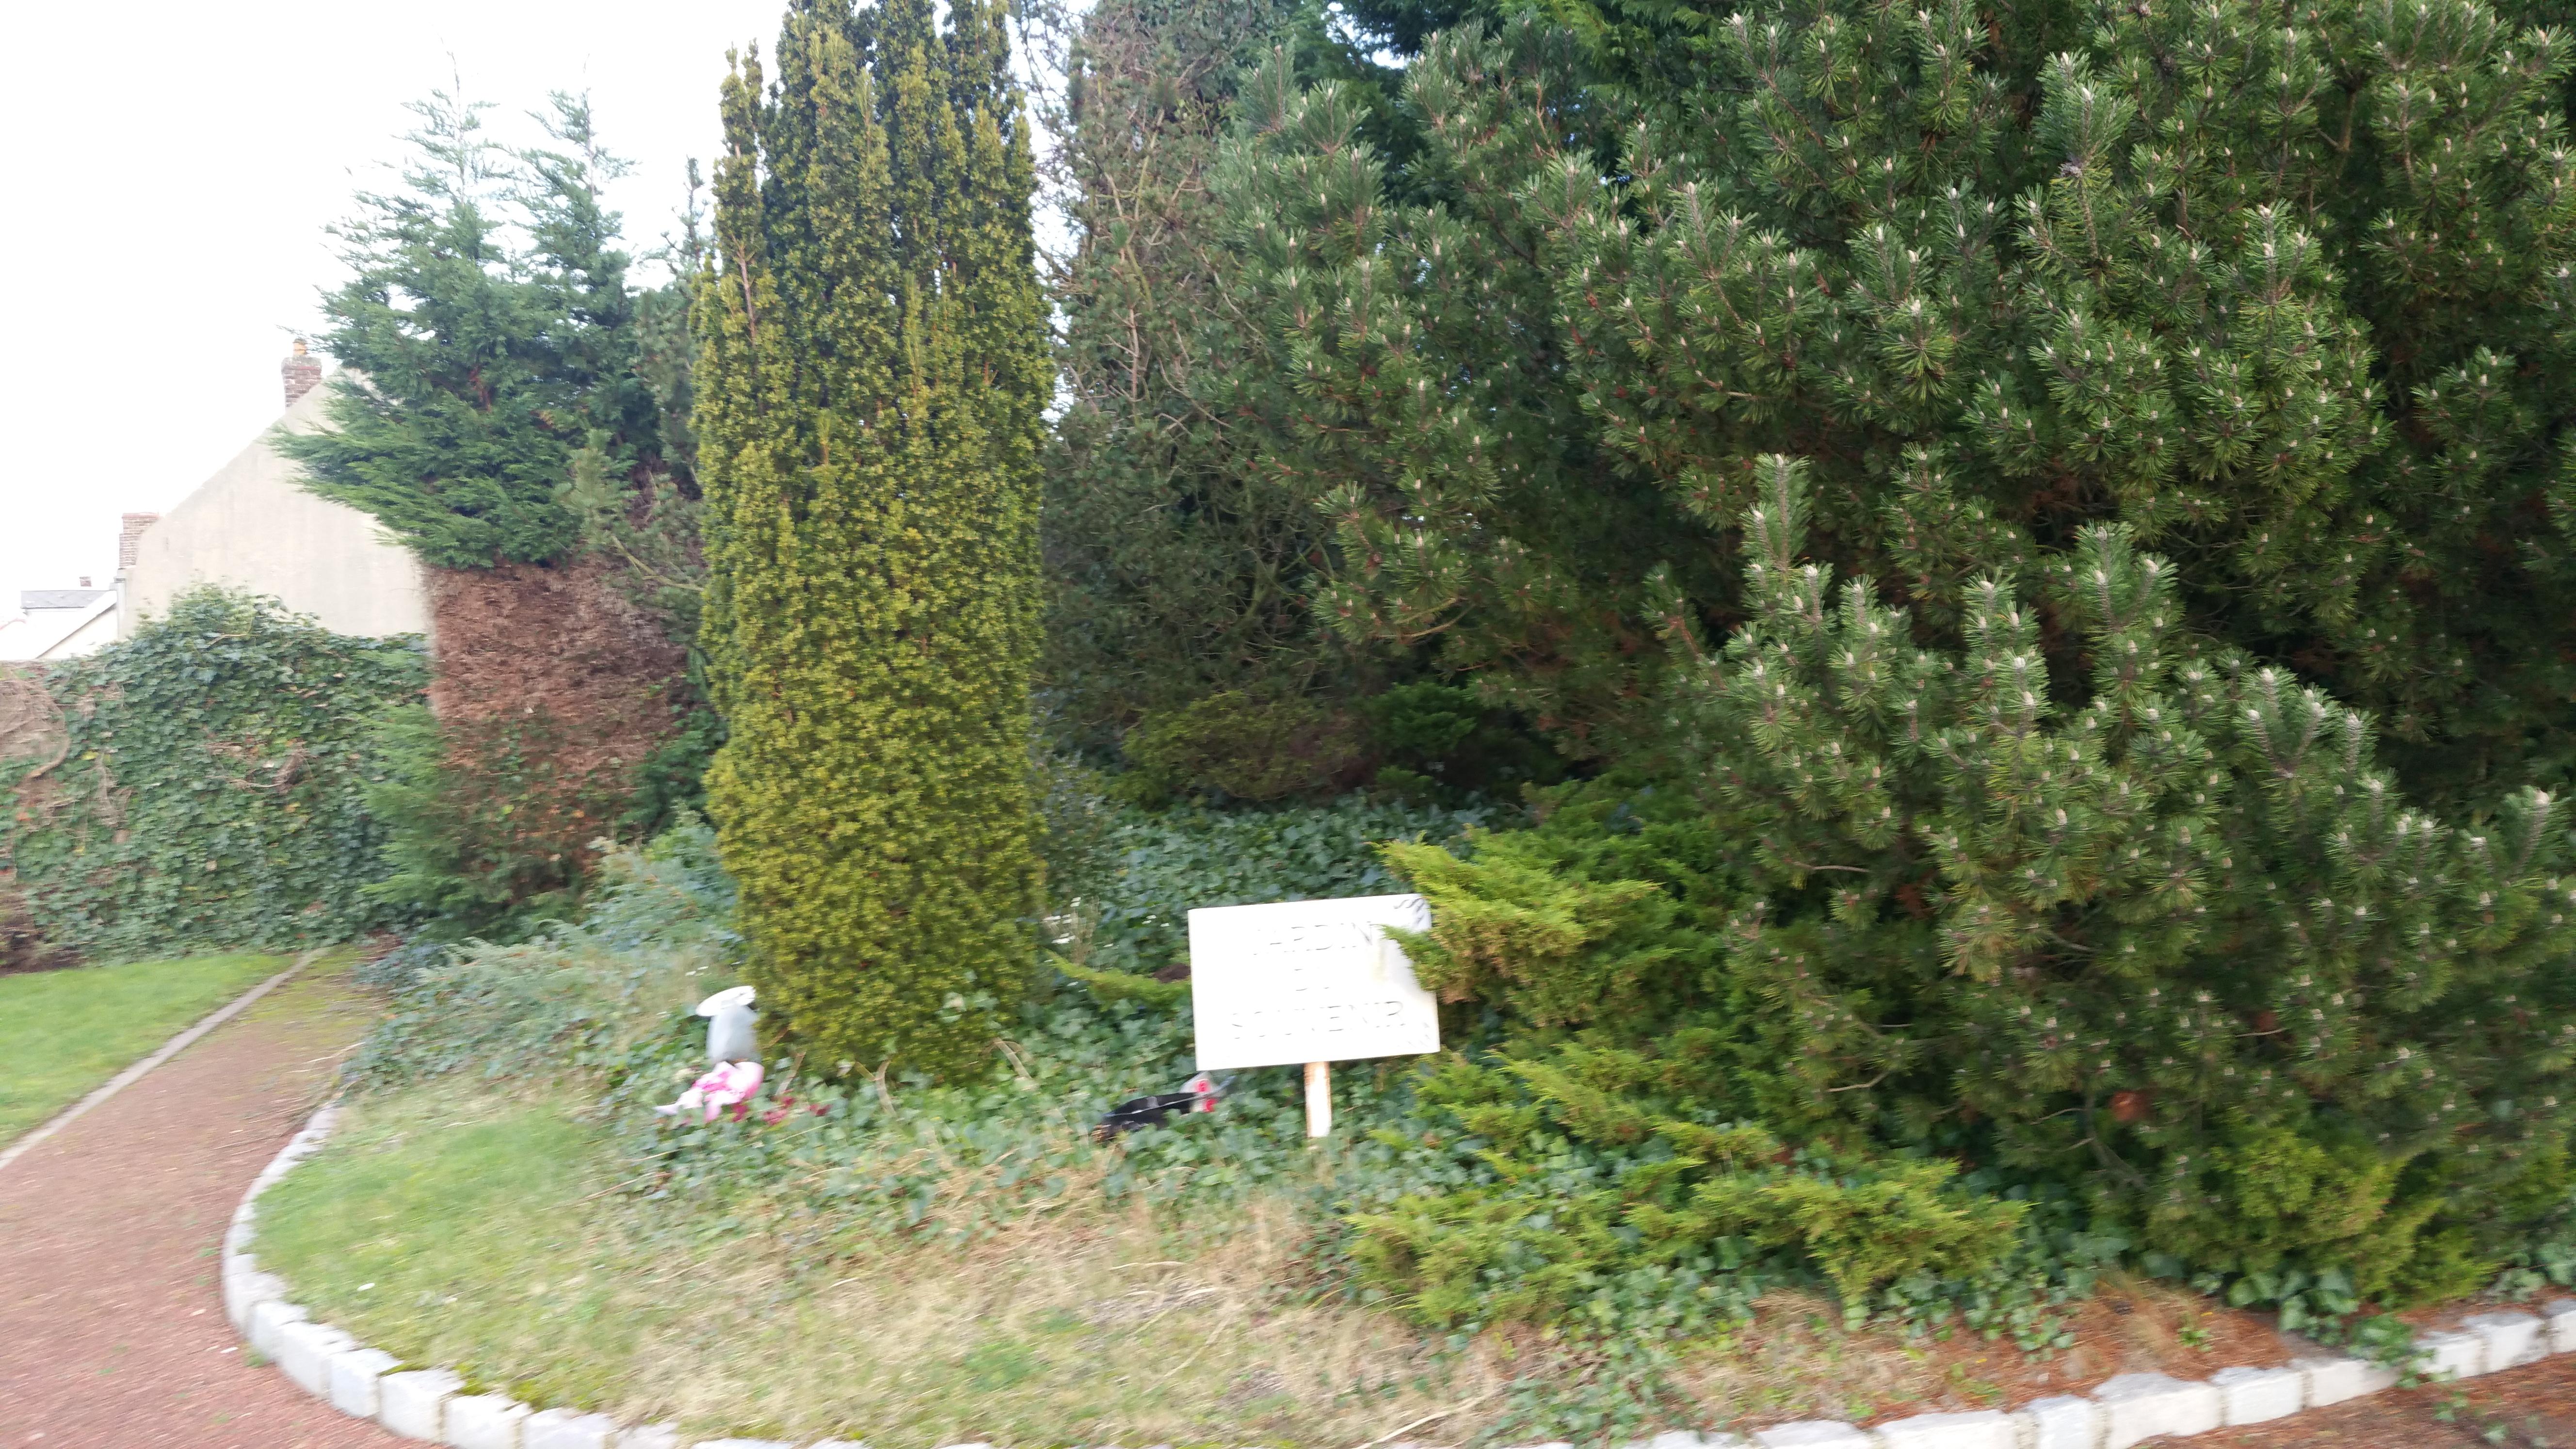 filebthune cimetire nord jardin du souvenirjpg - Jardin Du Souvenir